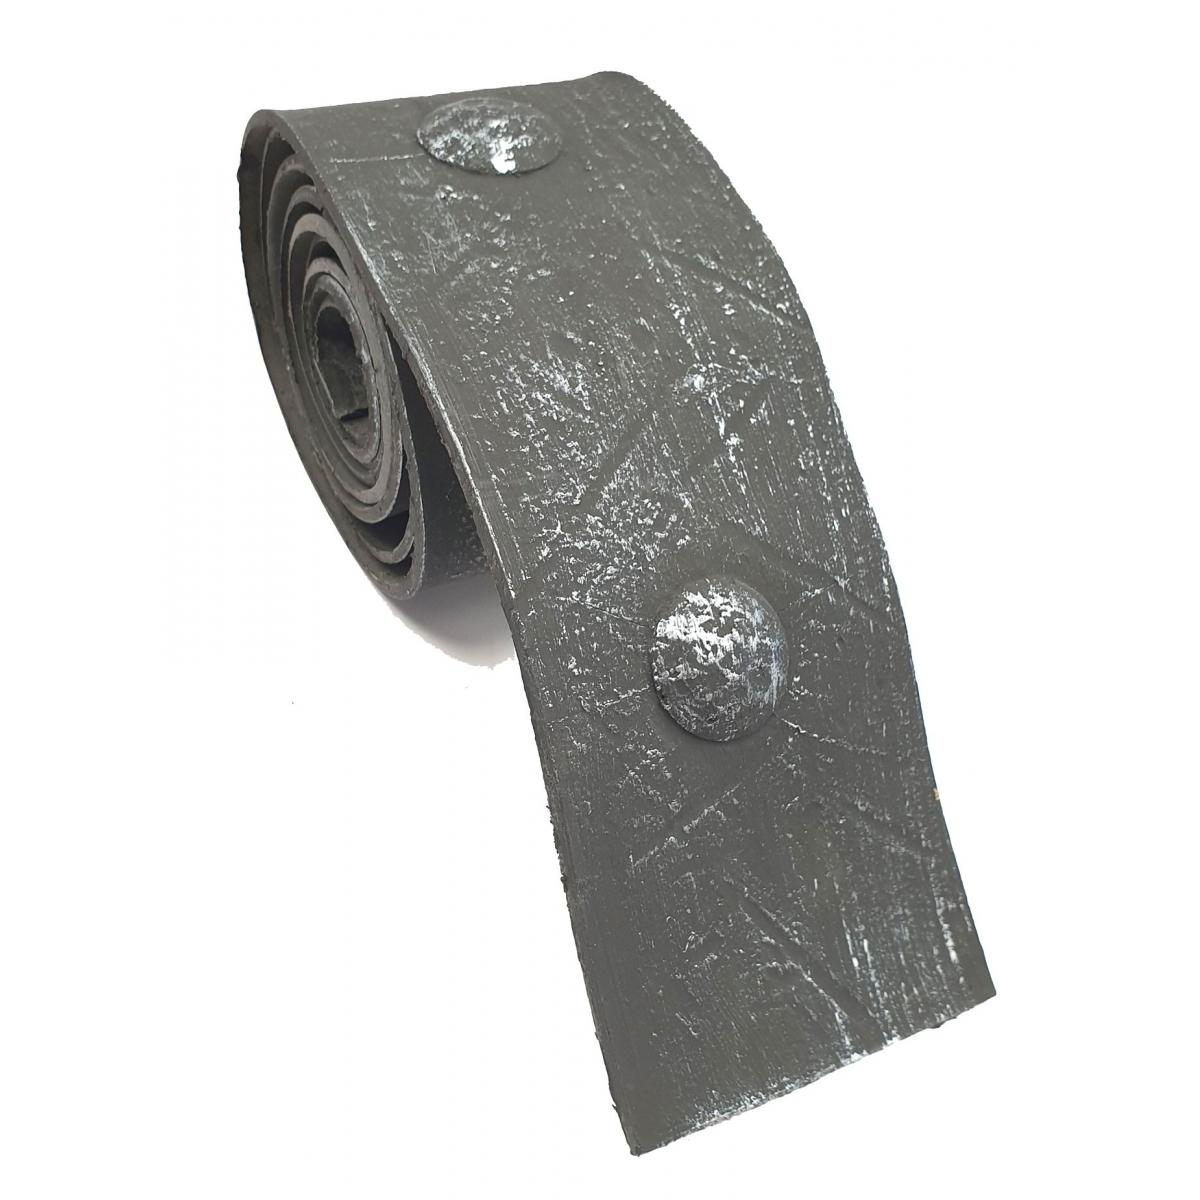 Rollo de unión imitación a forja 8 cm ancho plata vieja